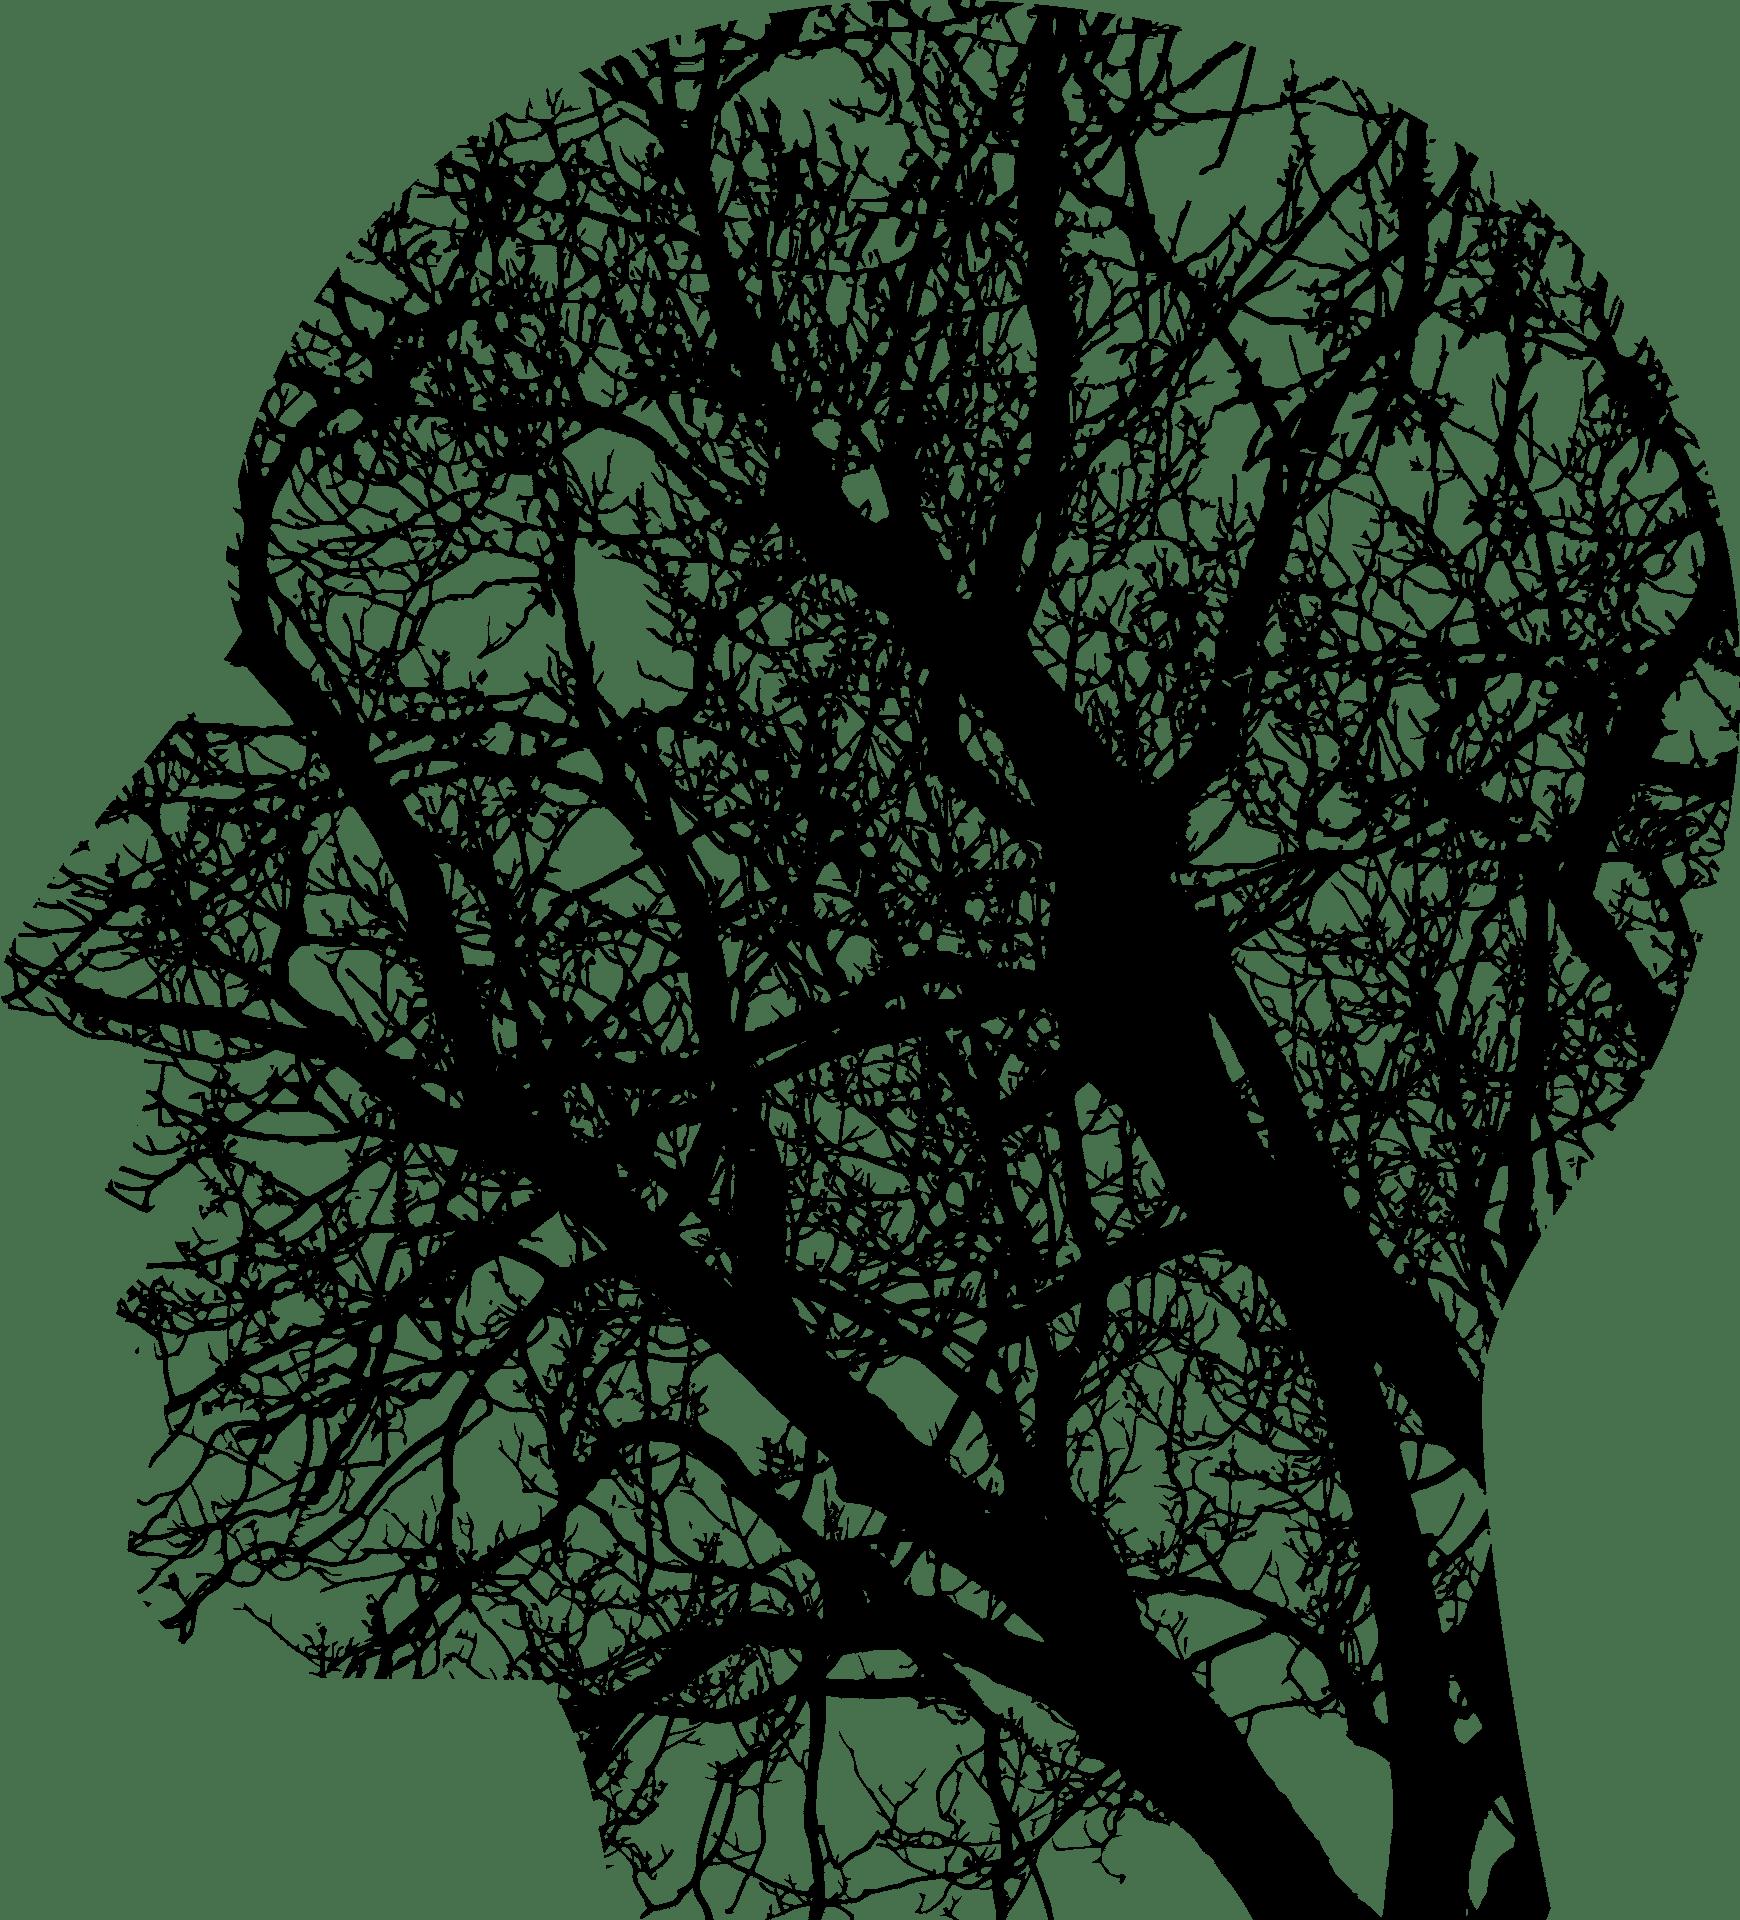 Kopf, Gehirn, Netz, Gedanken